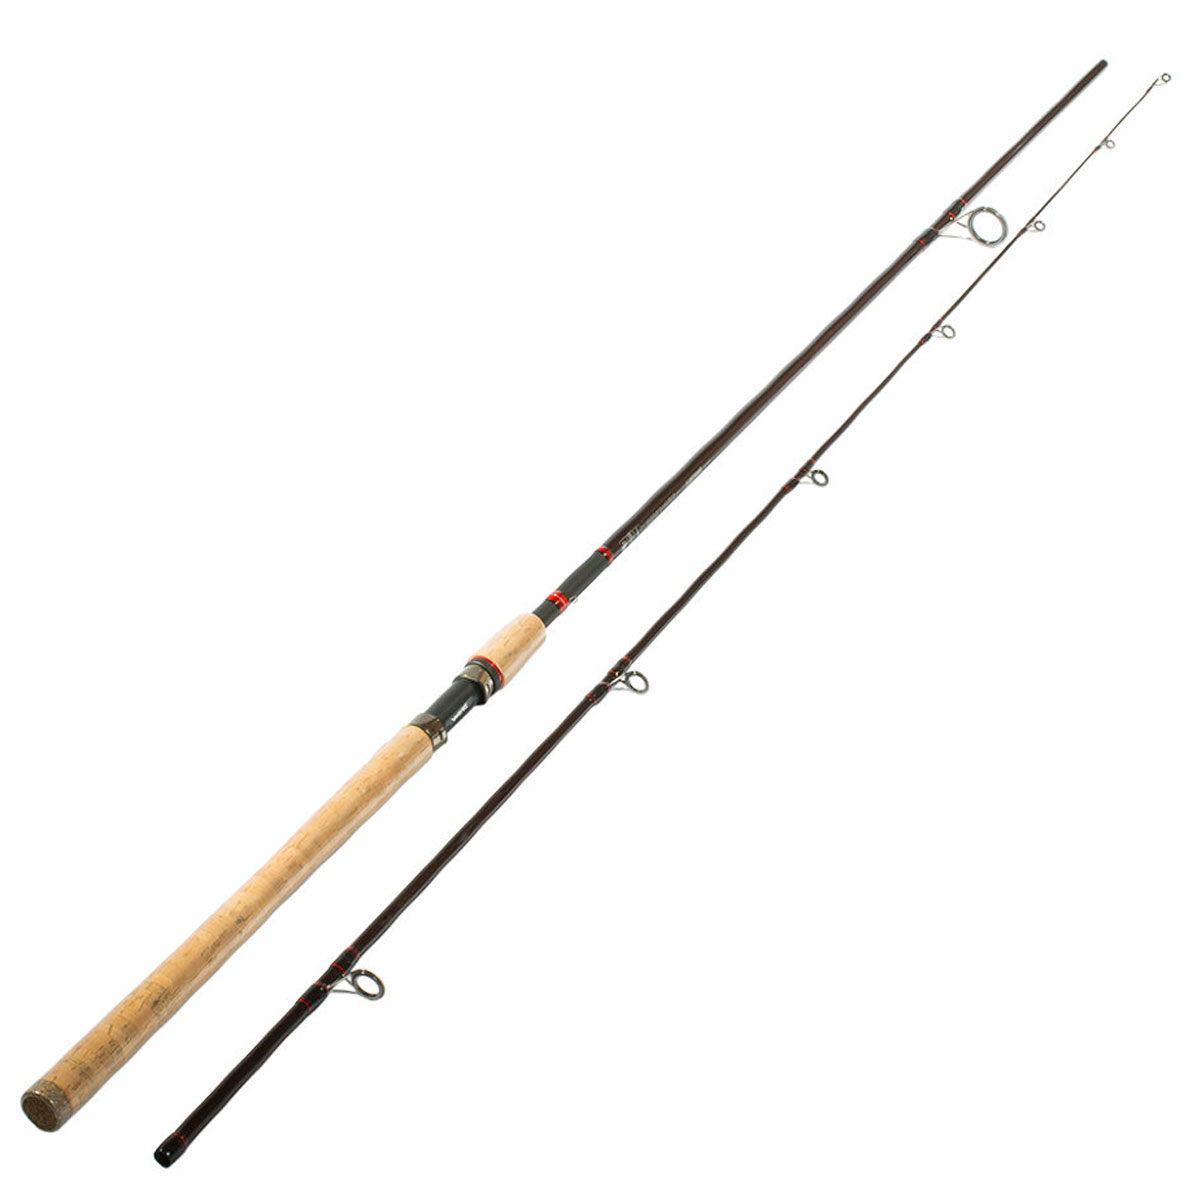 Спиннинг штекерный Daiwa Sweepfire, 2,1 м, 5-25 г